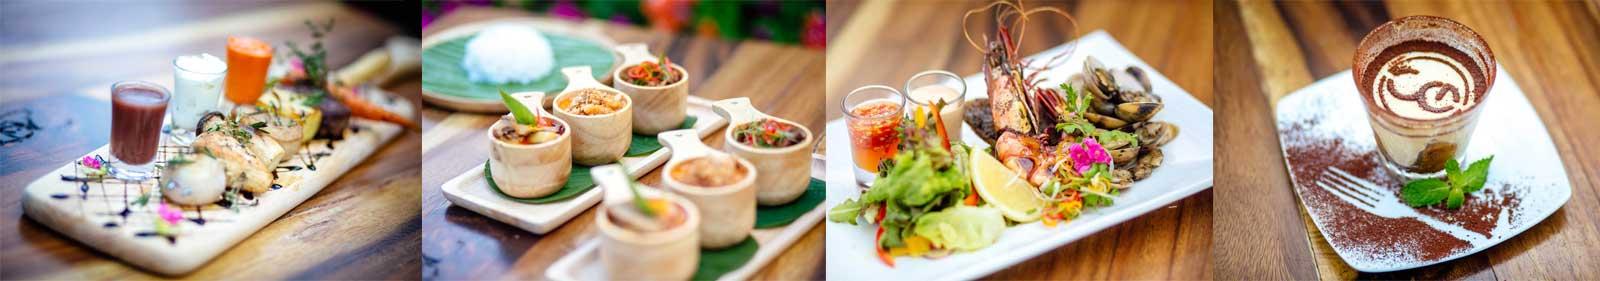 Delicious Food Choices at Secret Garden Beach Resort